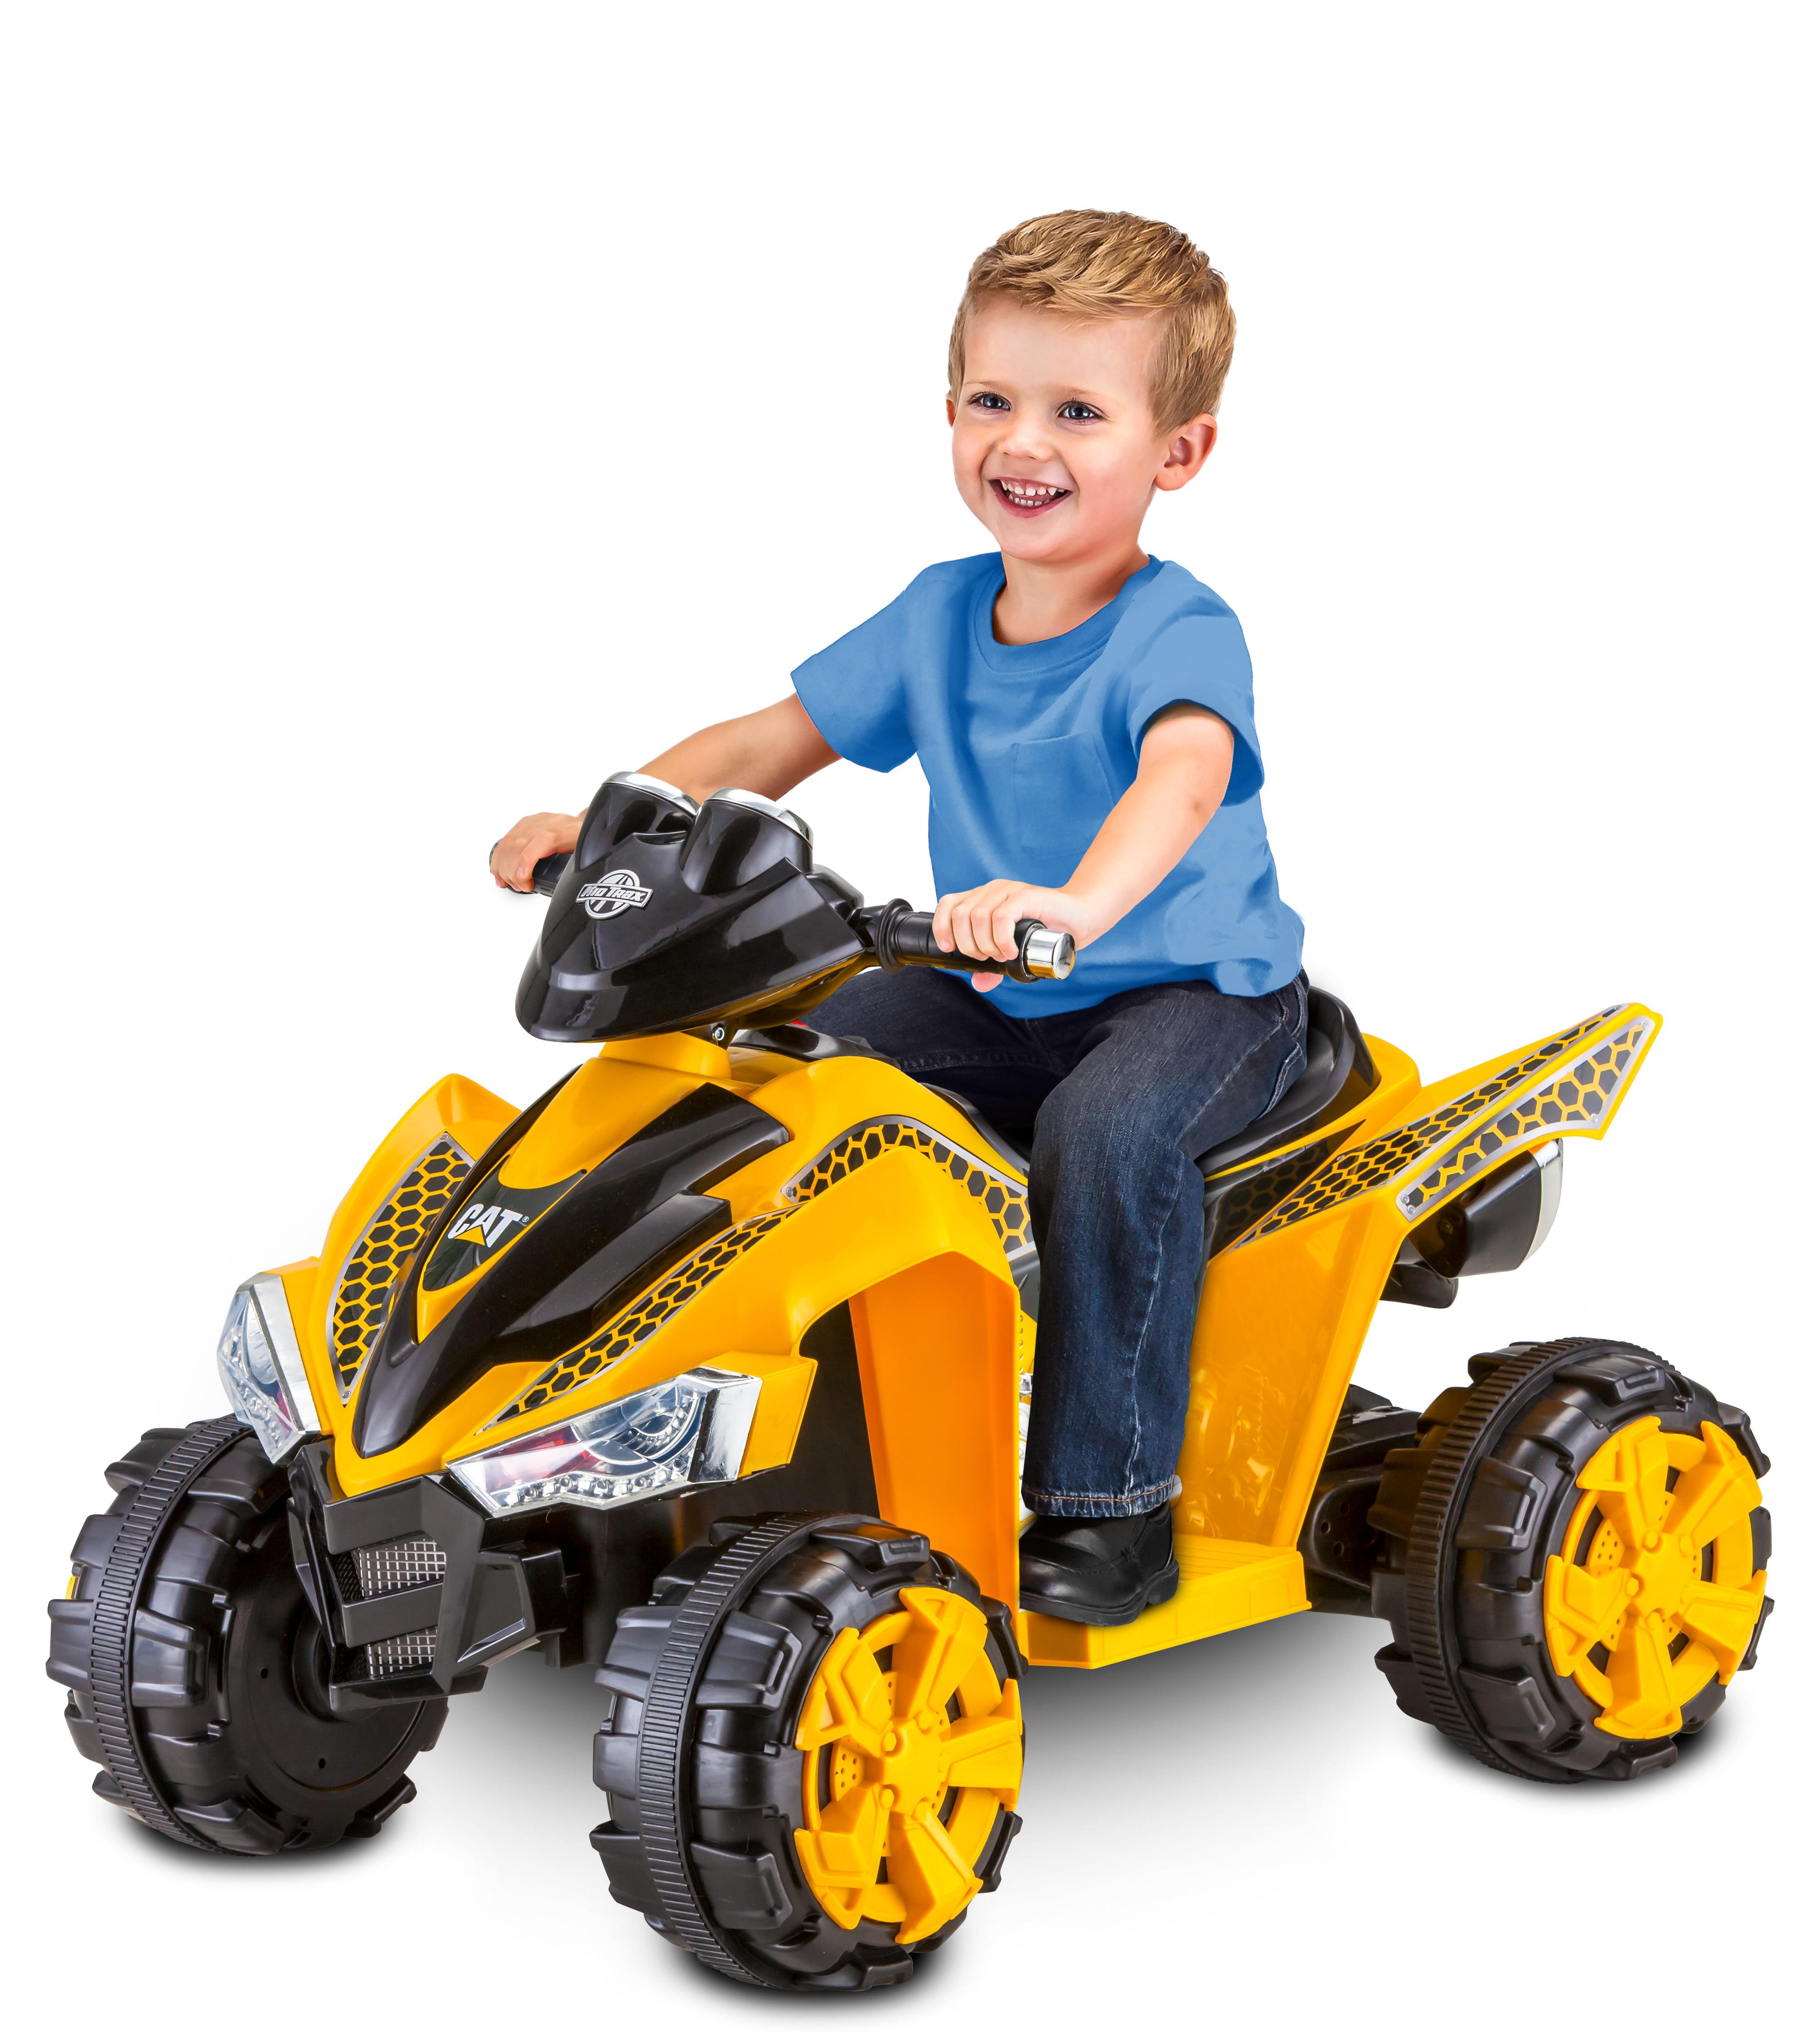 Kid Trax CAT 6V Battery Powered ATV, Yellow